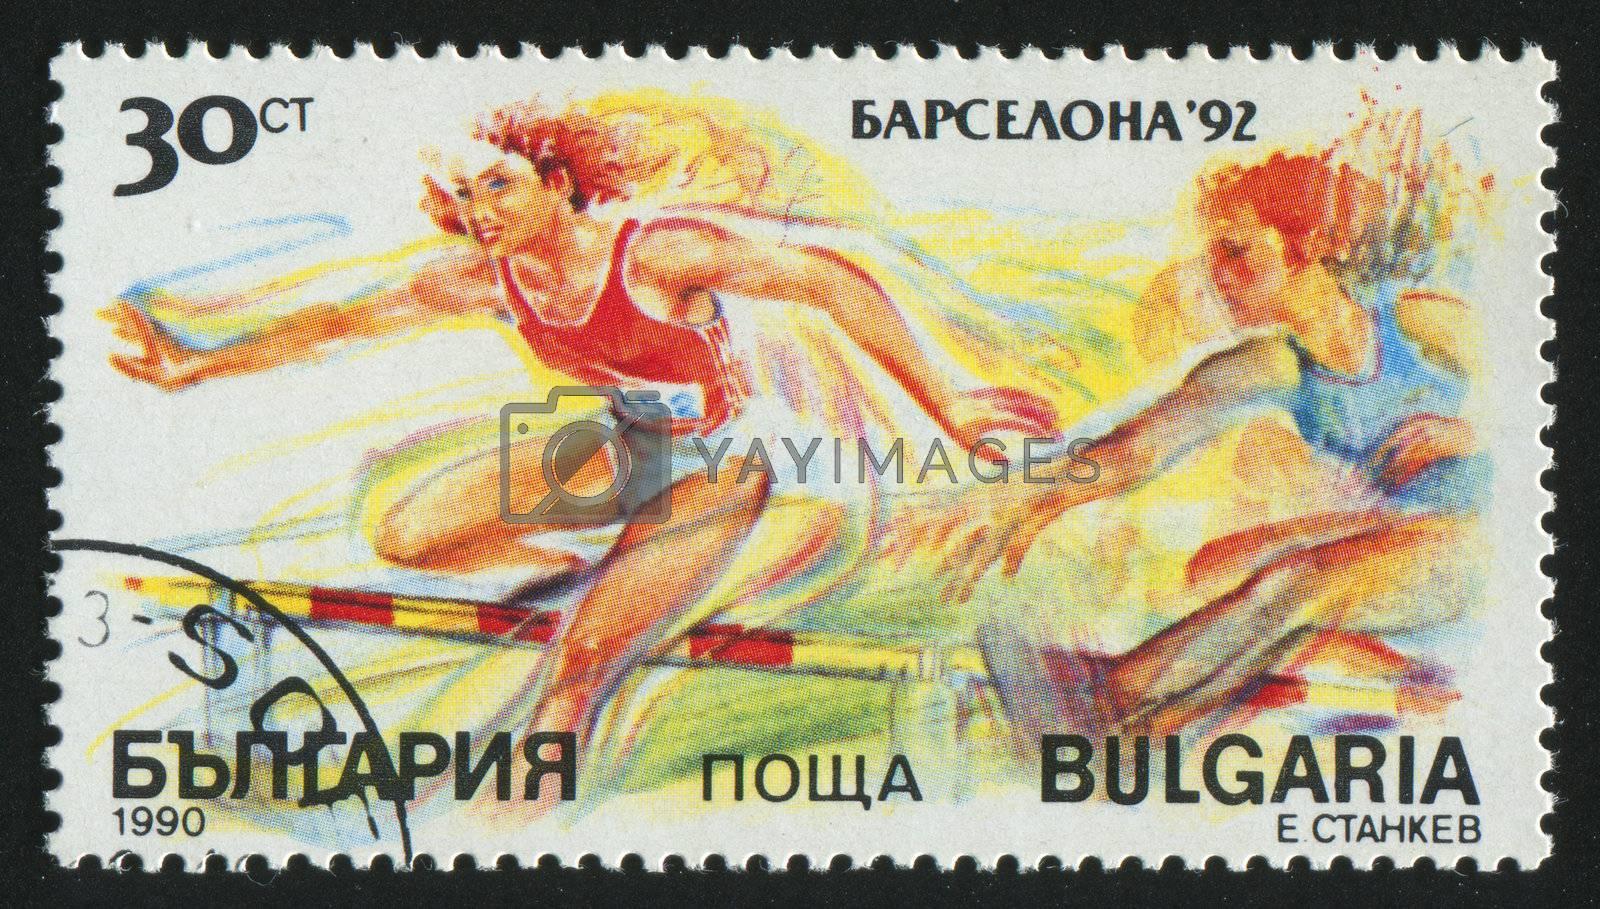 BULGARIA - CIRCA 1990: stamp printed by Bulgaria, shows woman runner, circa 1990.